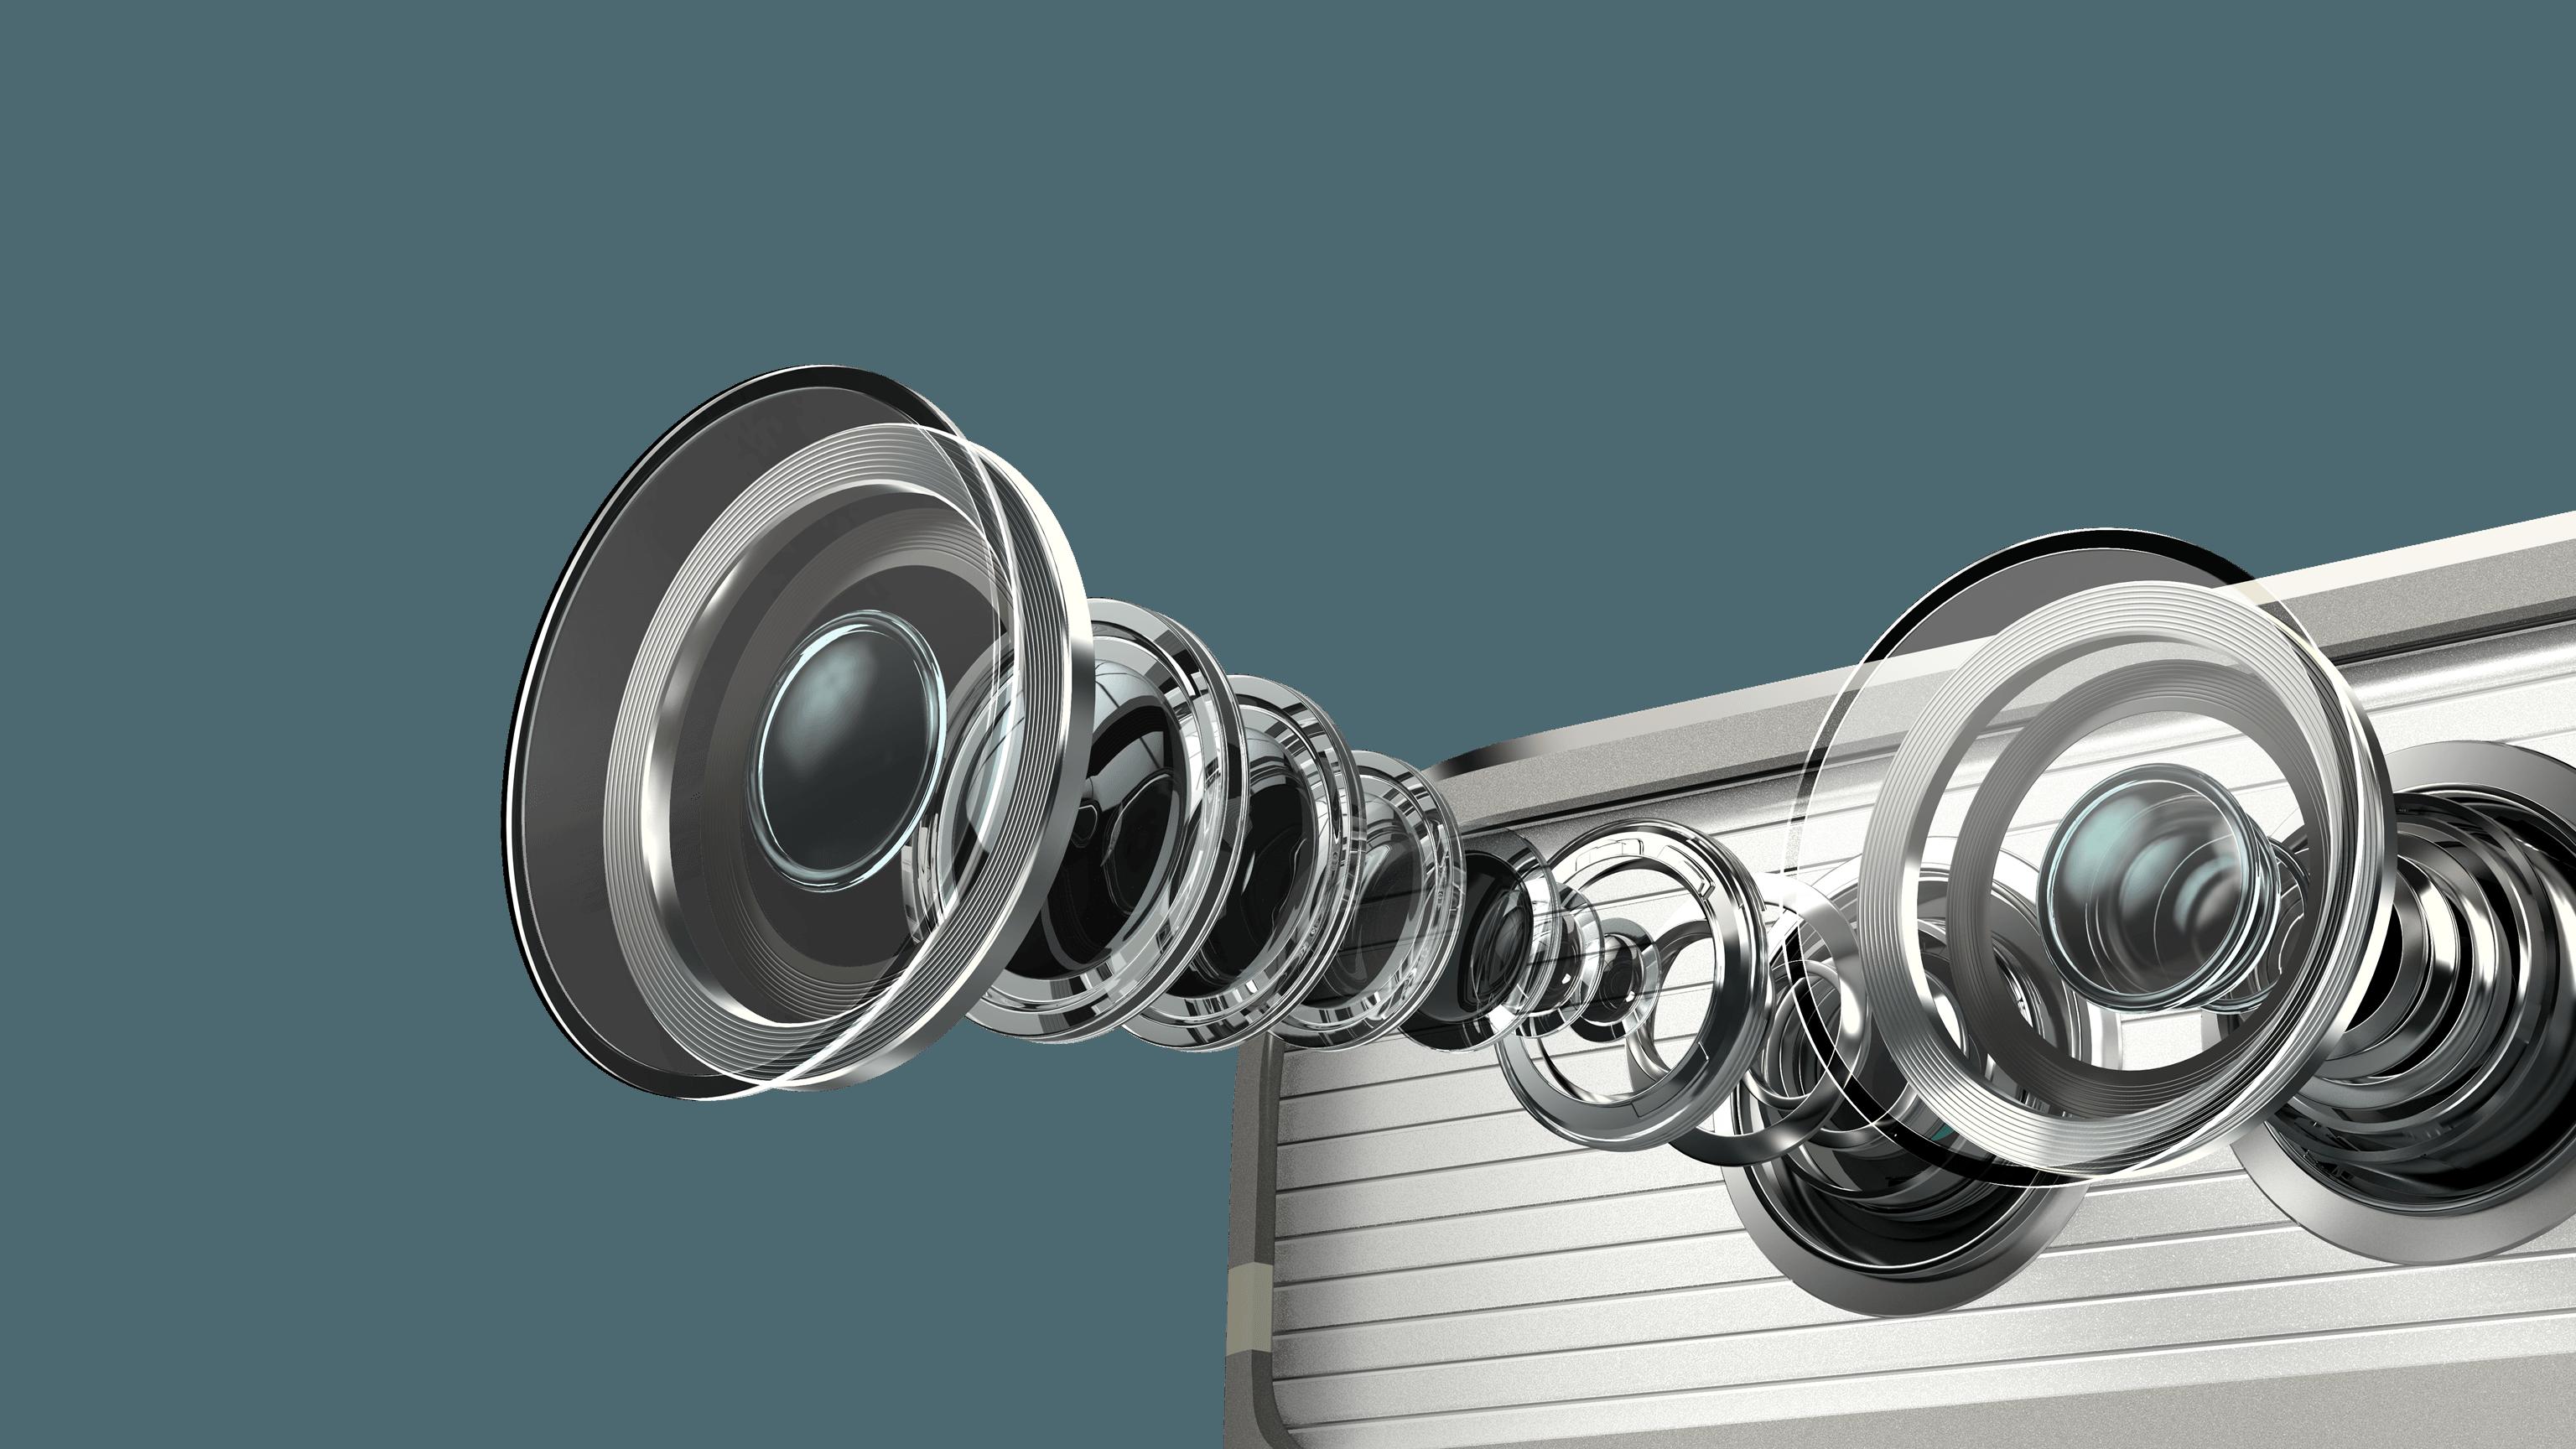 Huawei-P9 – Dual-Camera Smartphone